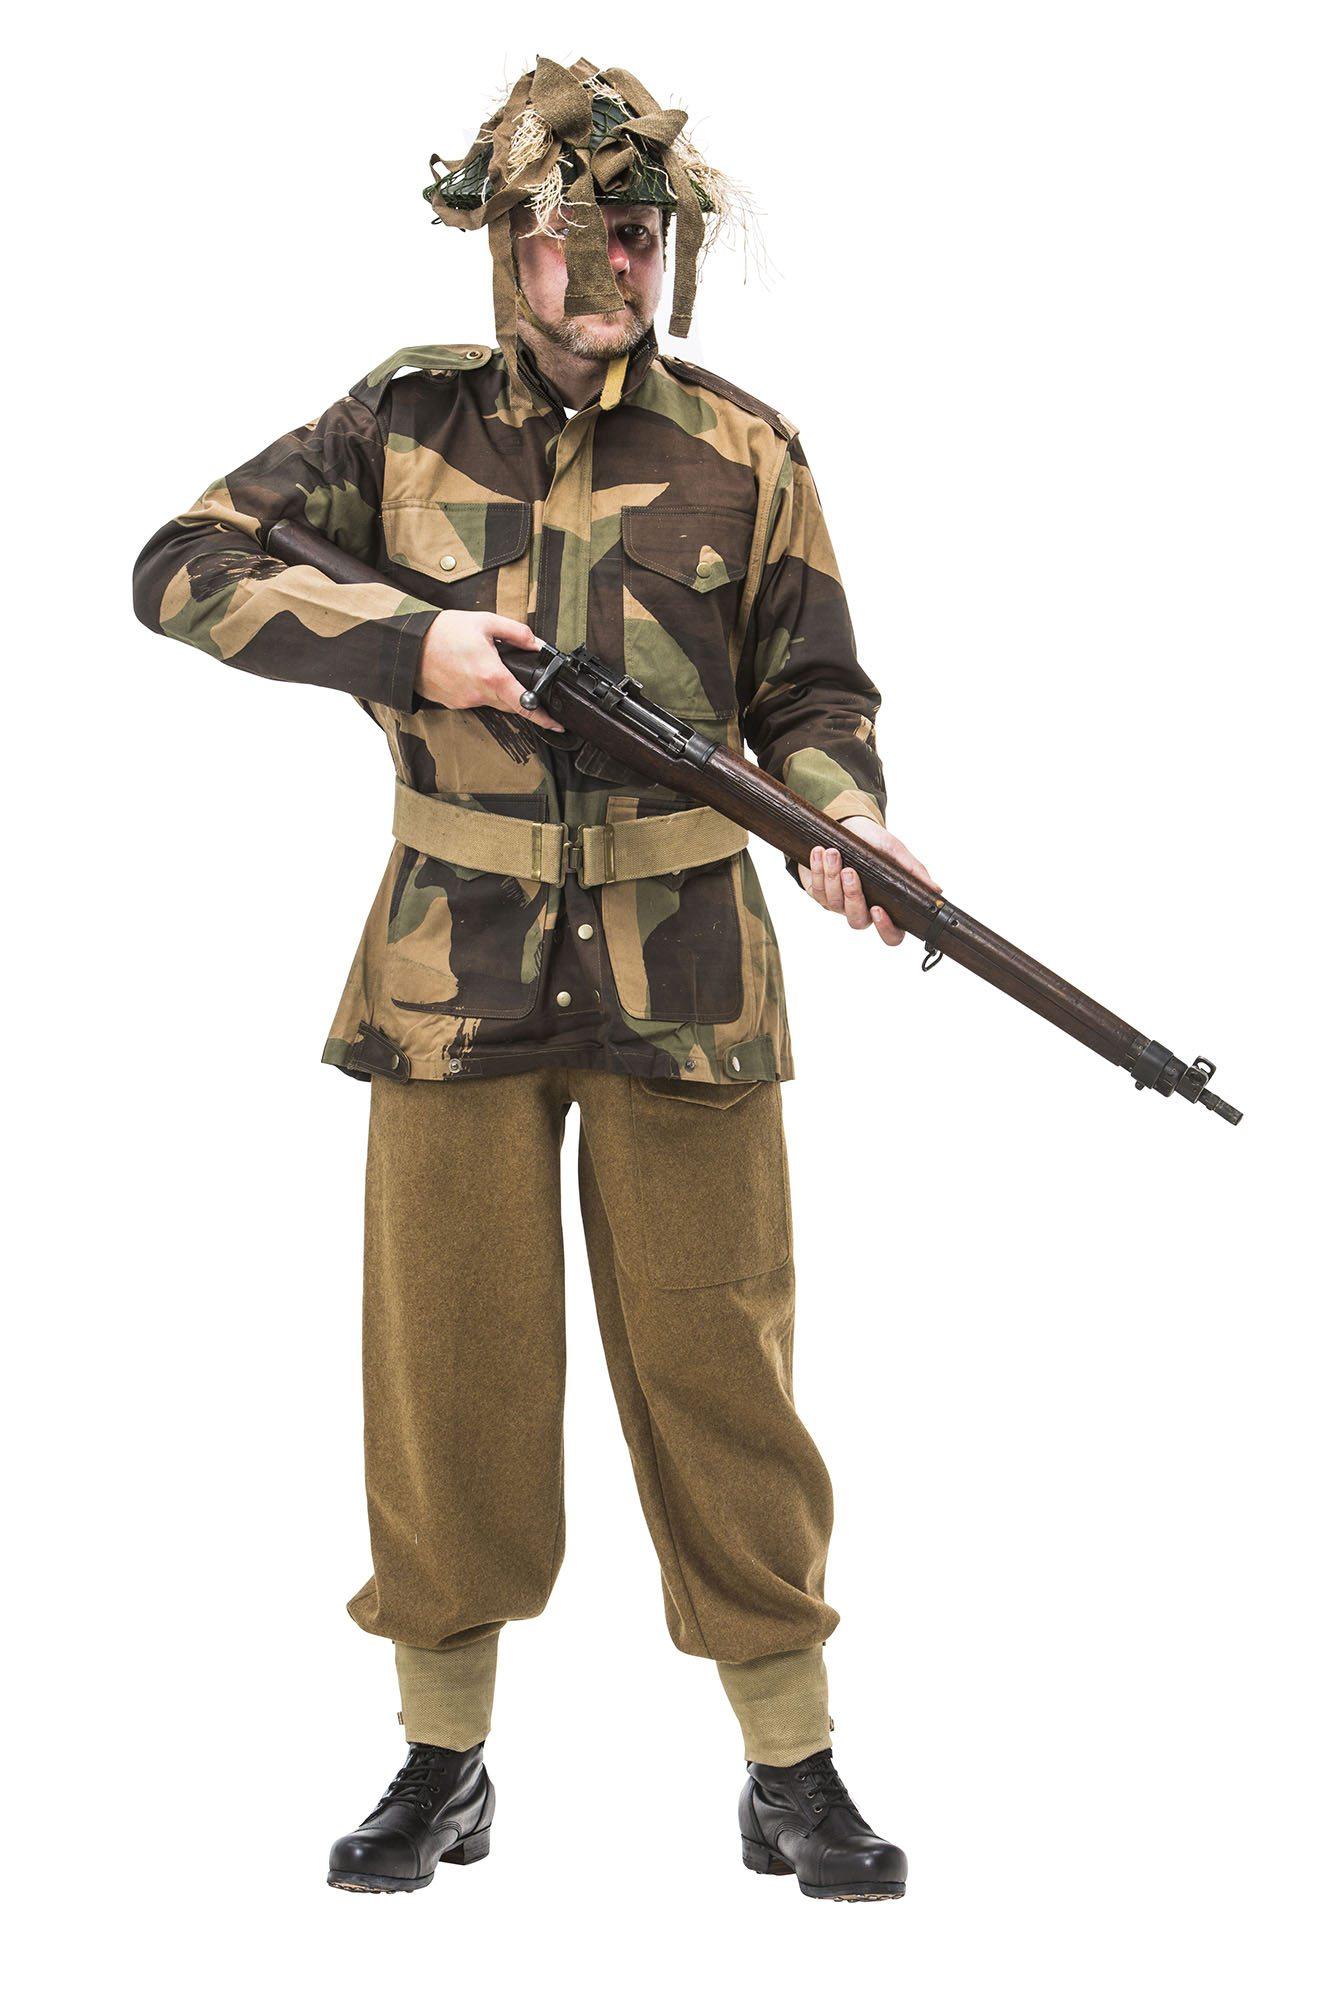 Ww2 British Army Sniper Uniform Reproduction Ww1 And Ww2